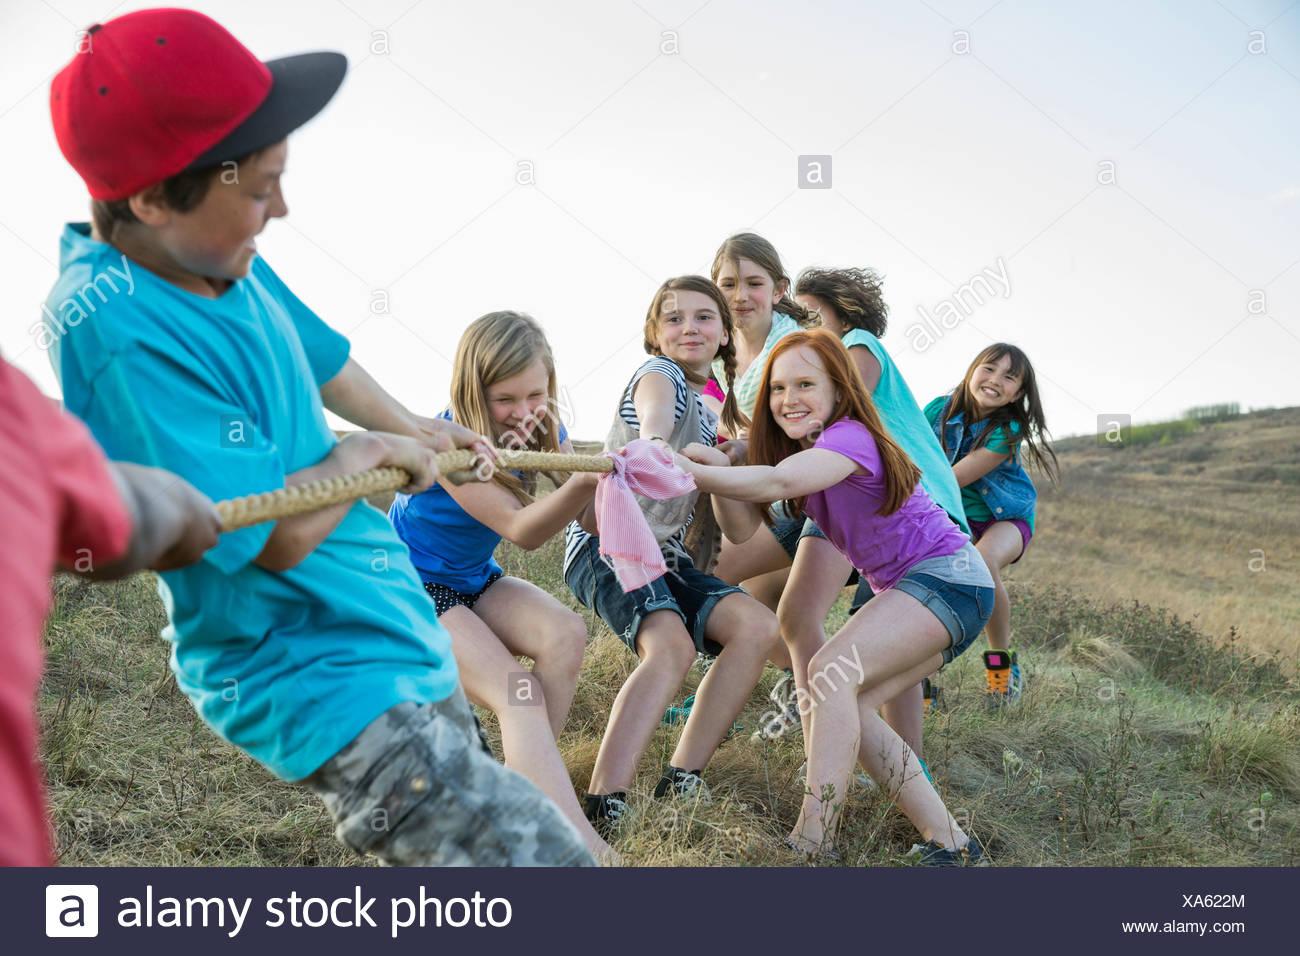 Schoolchildren playing tug-of-war - Stock Image